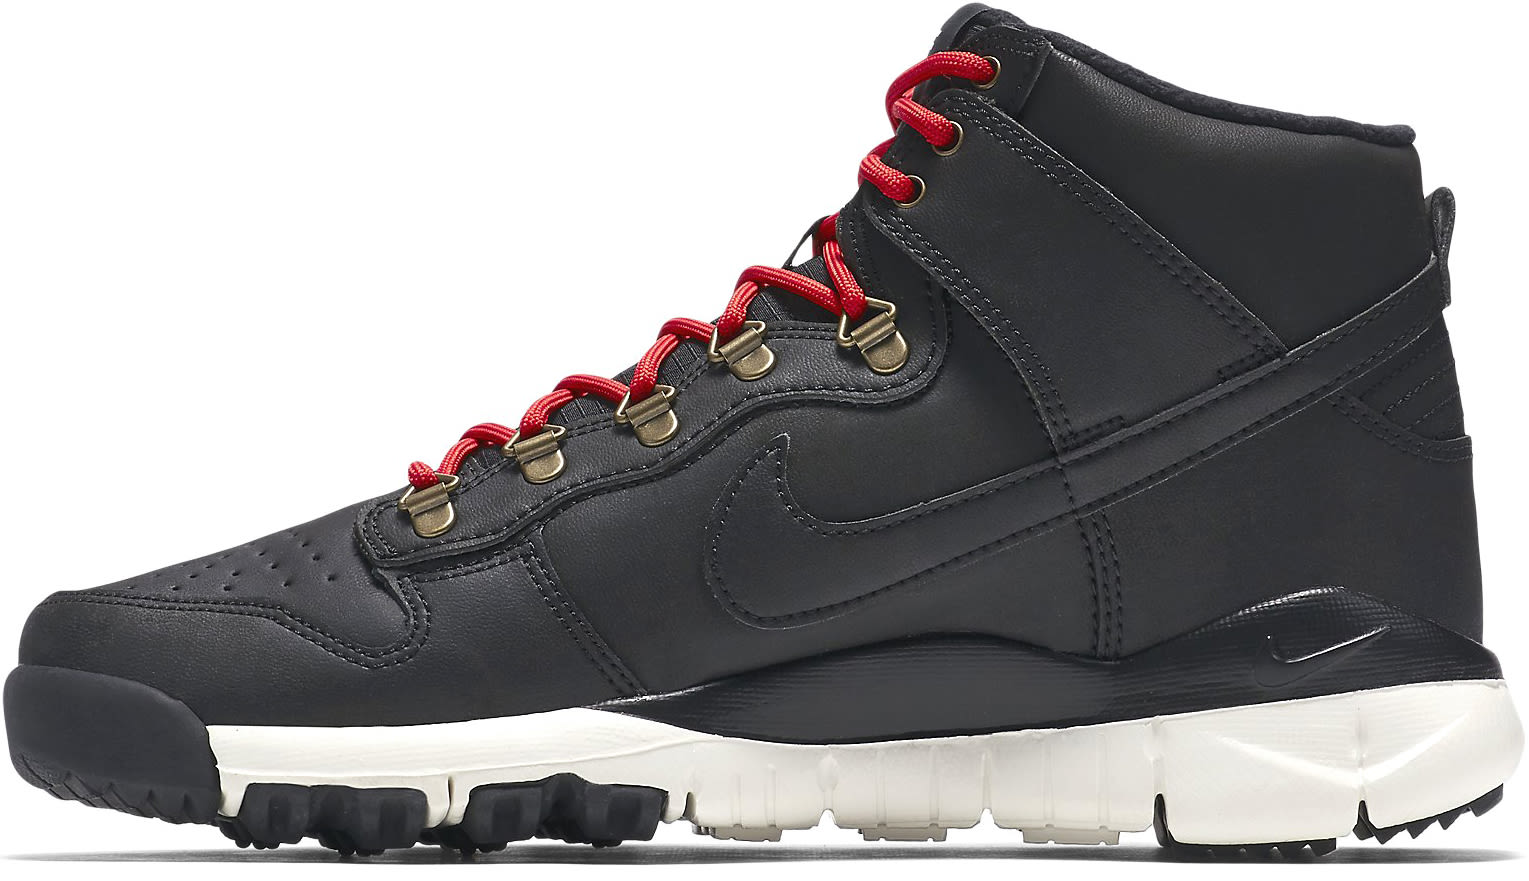 ef30c3c28a659 Nike SB Dunk High Hiking Boots - thumbnail 2